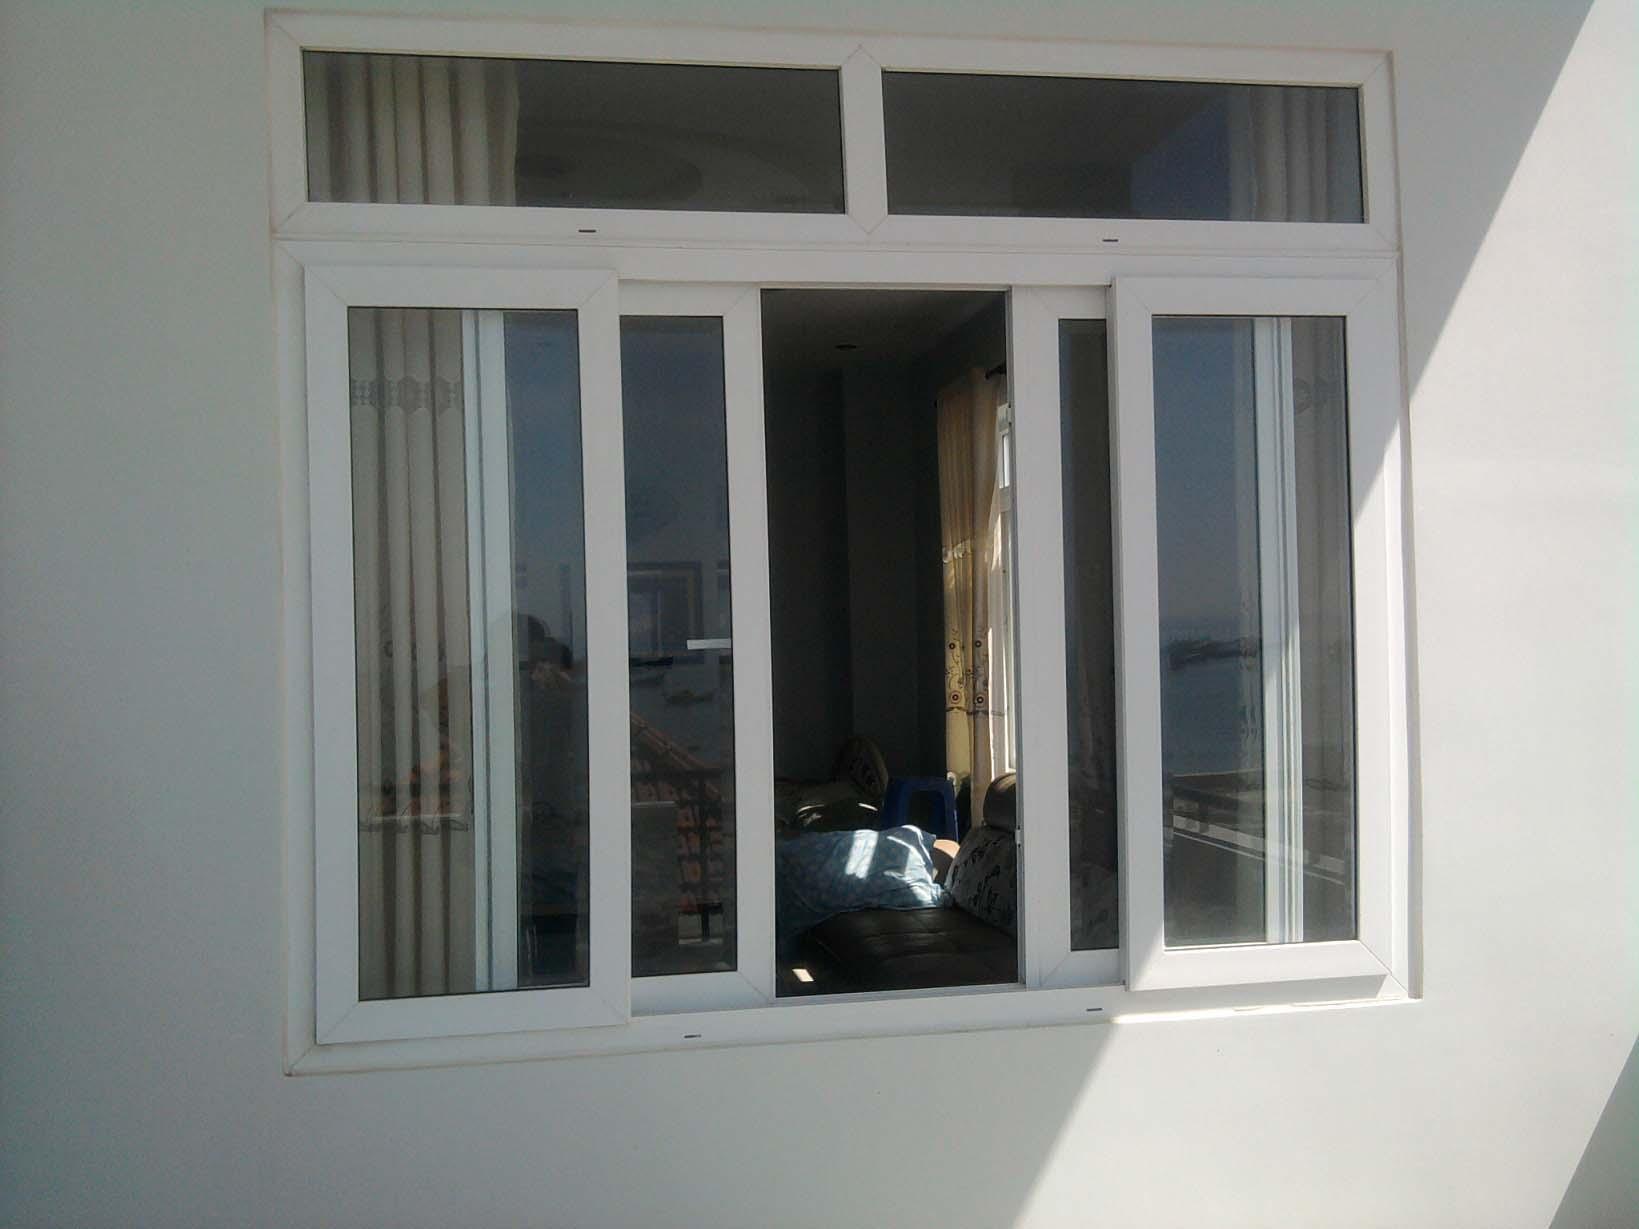 Mẫu cửa sổ 4 cánh đẹp